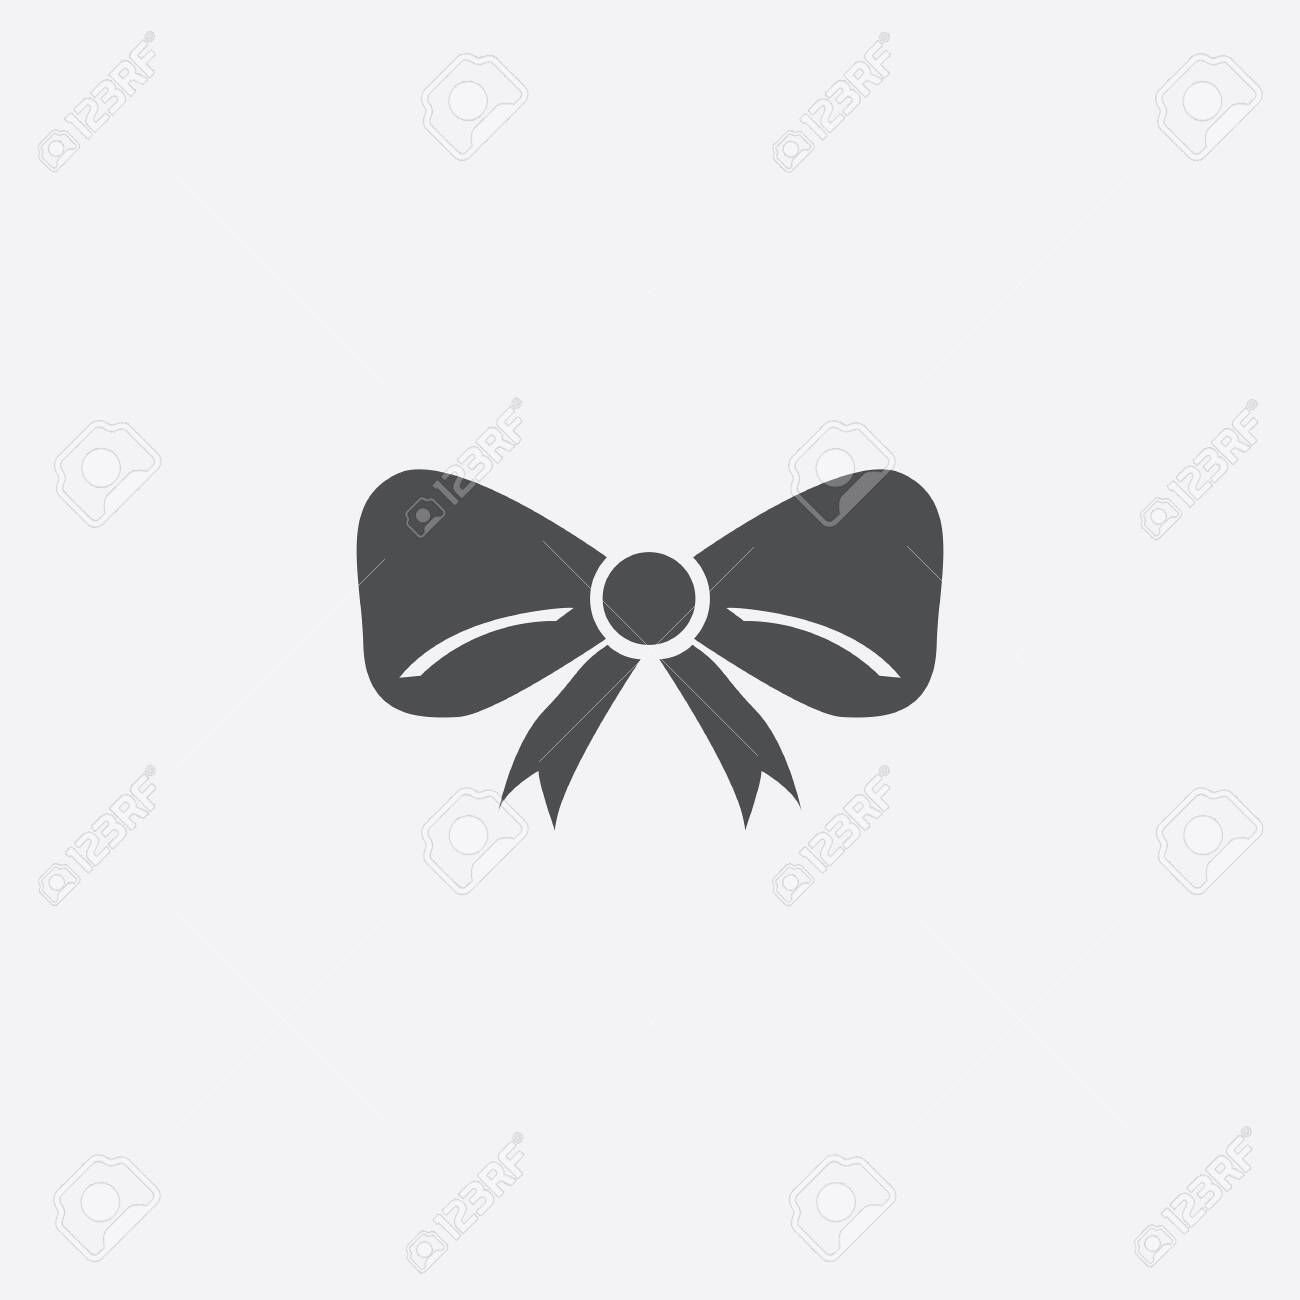 festive bow icon - 143431849